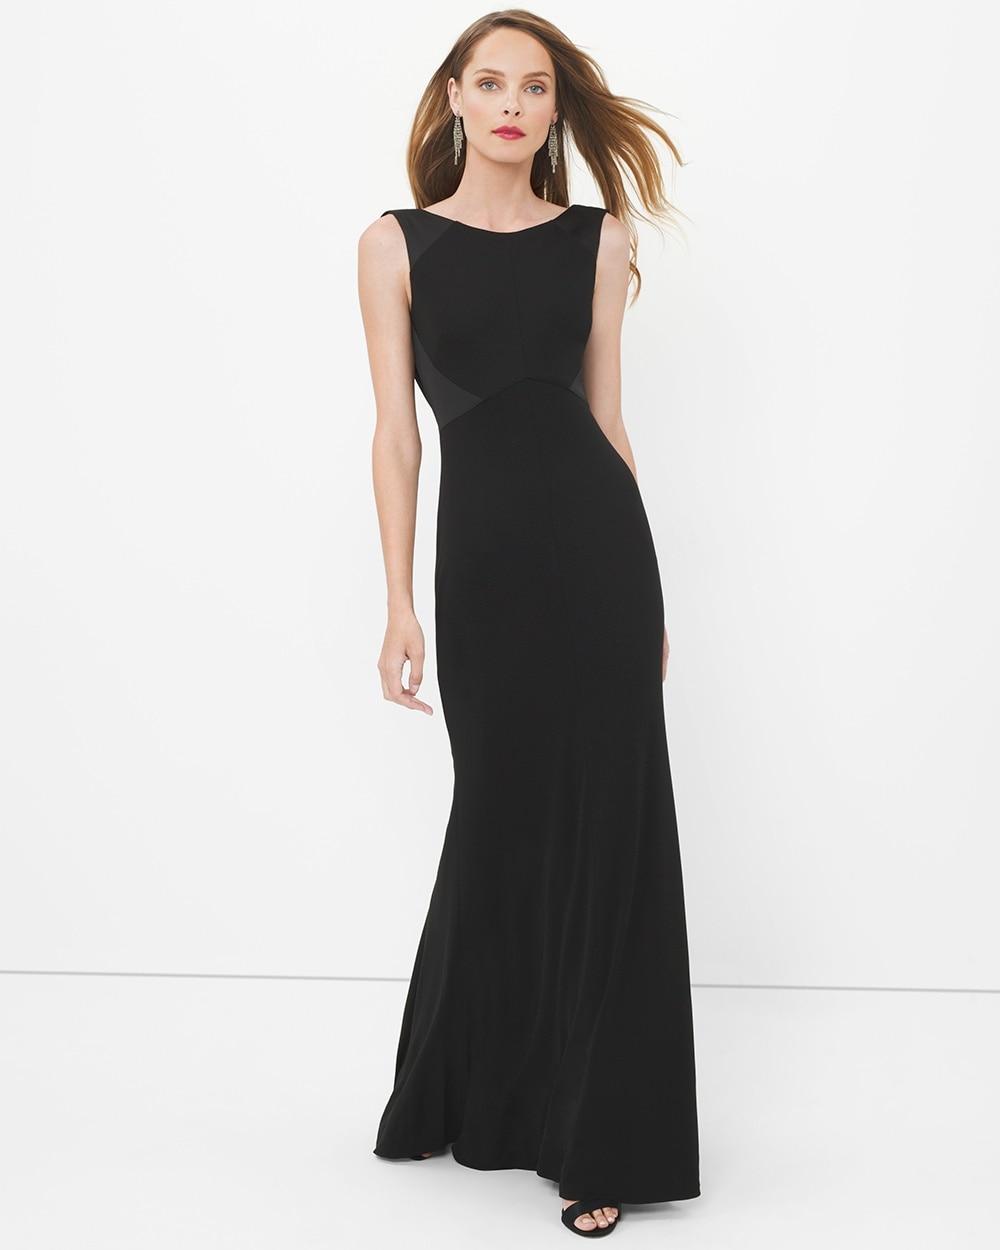 Black Drape Back Gown - White House Black Market